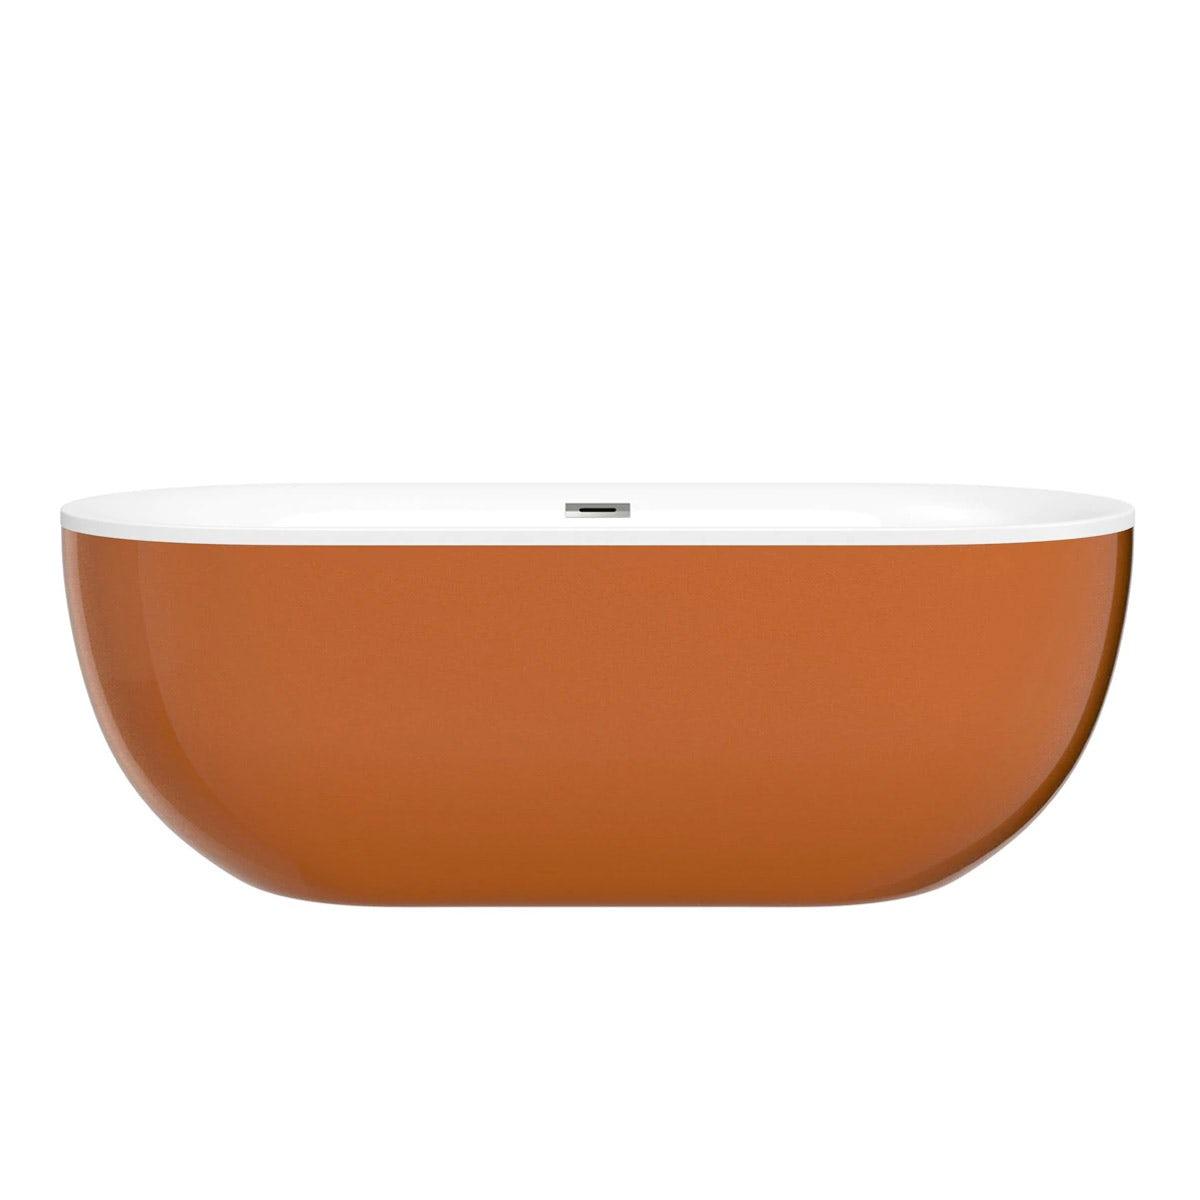 Mode Ellis cinnamon coloured freestanding bath